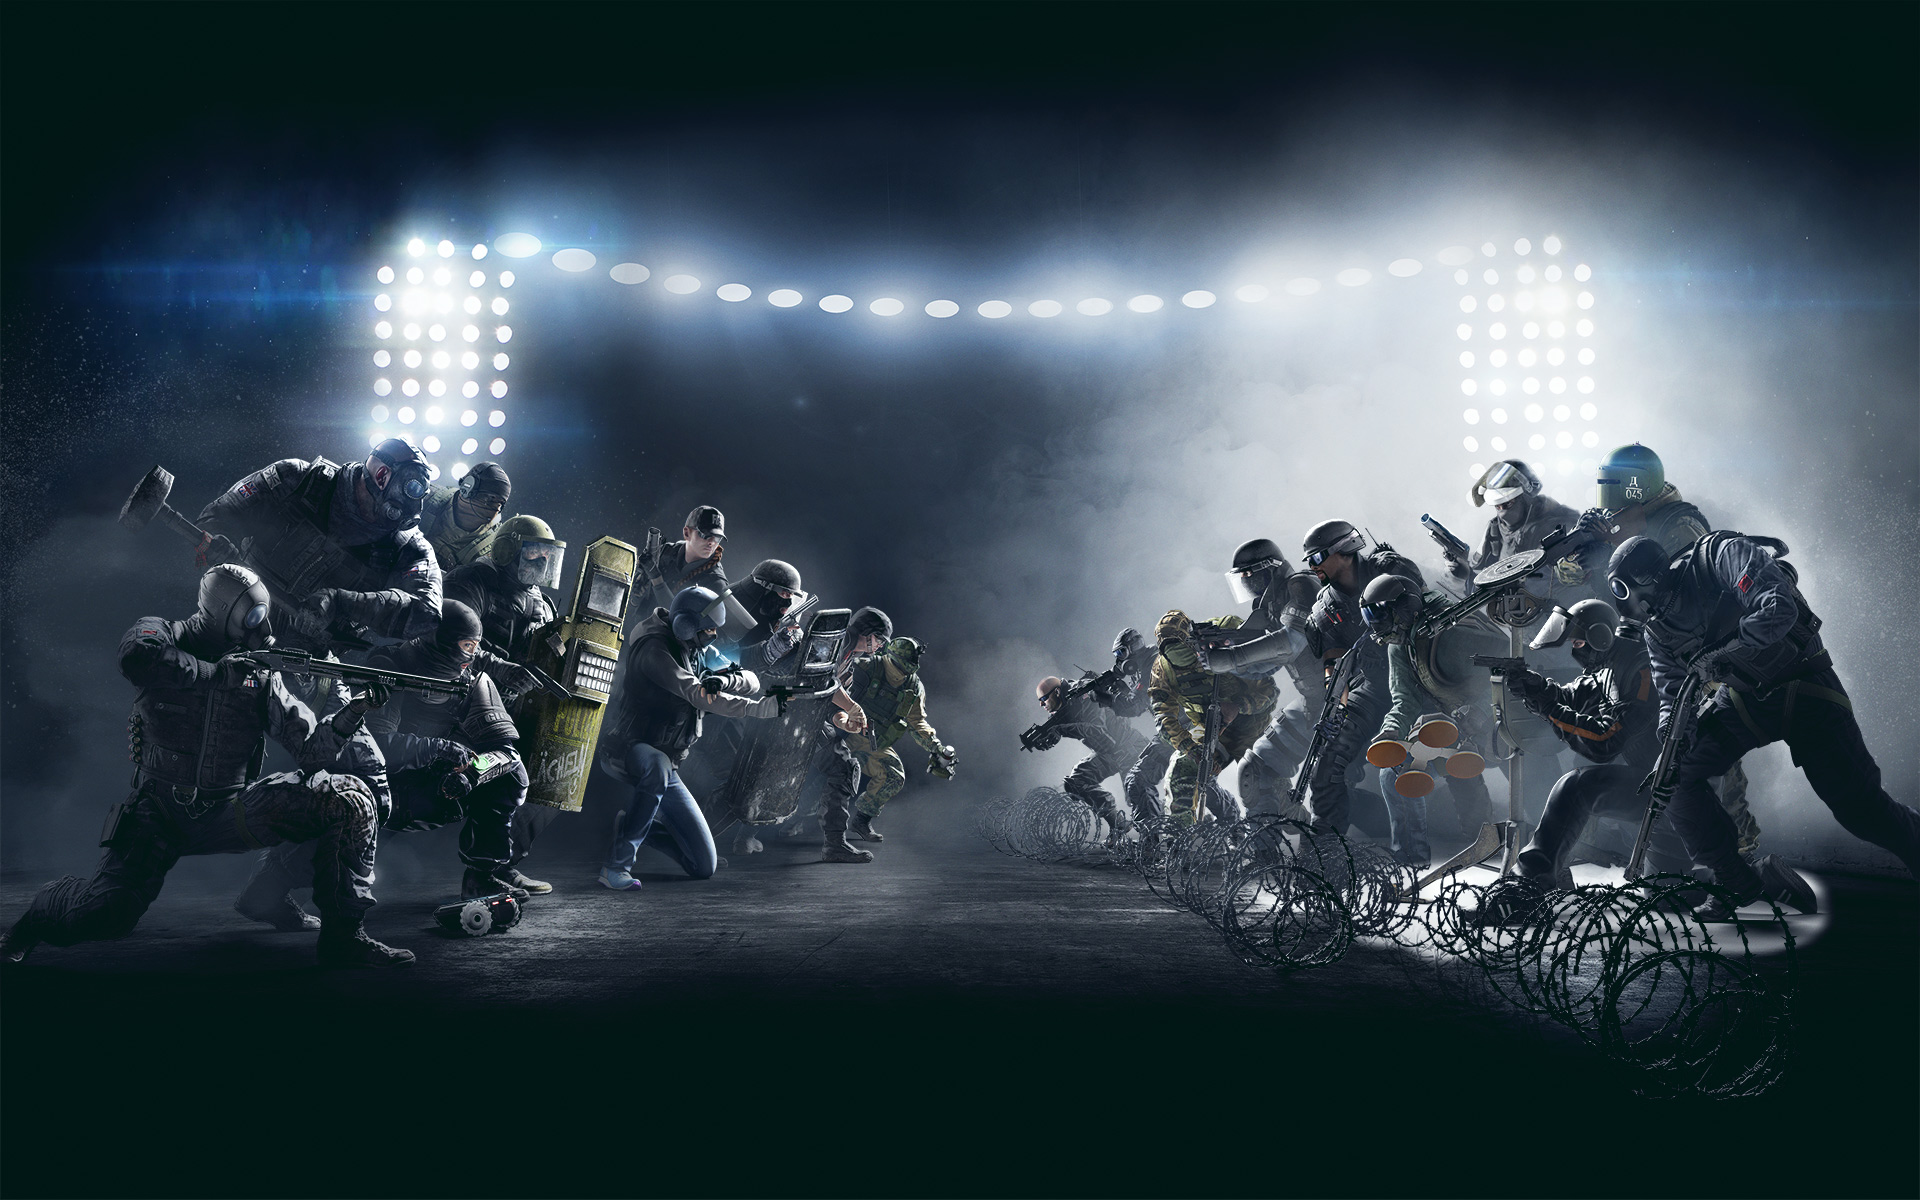 La Rainbox Six Pro League si espande sempre di più